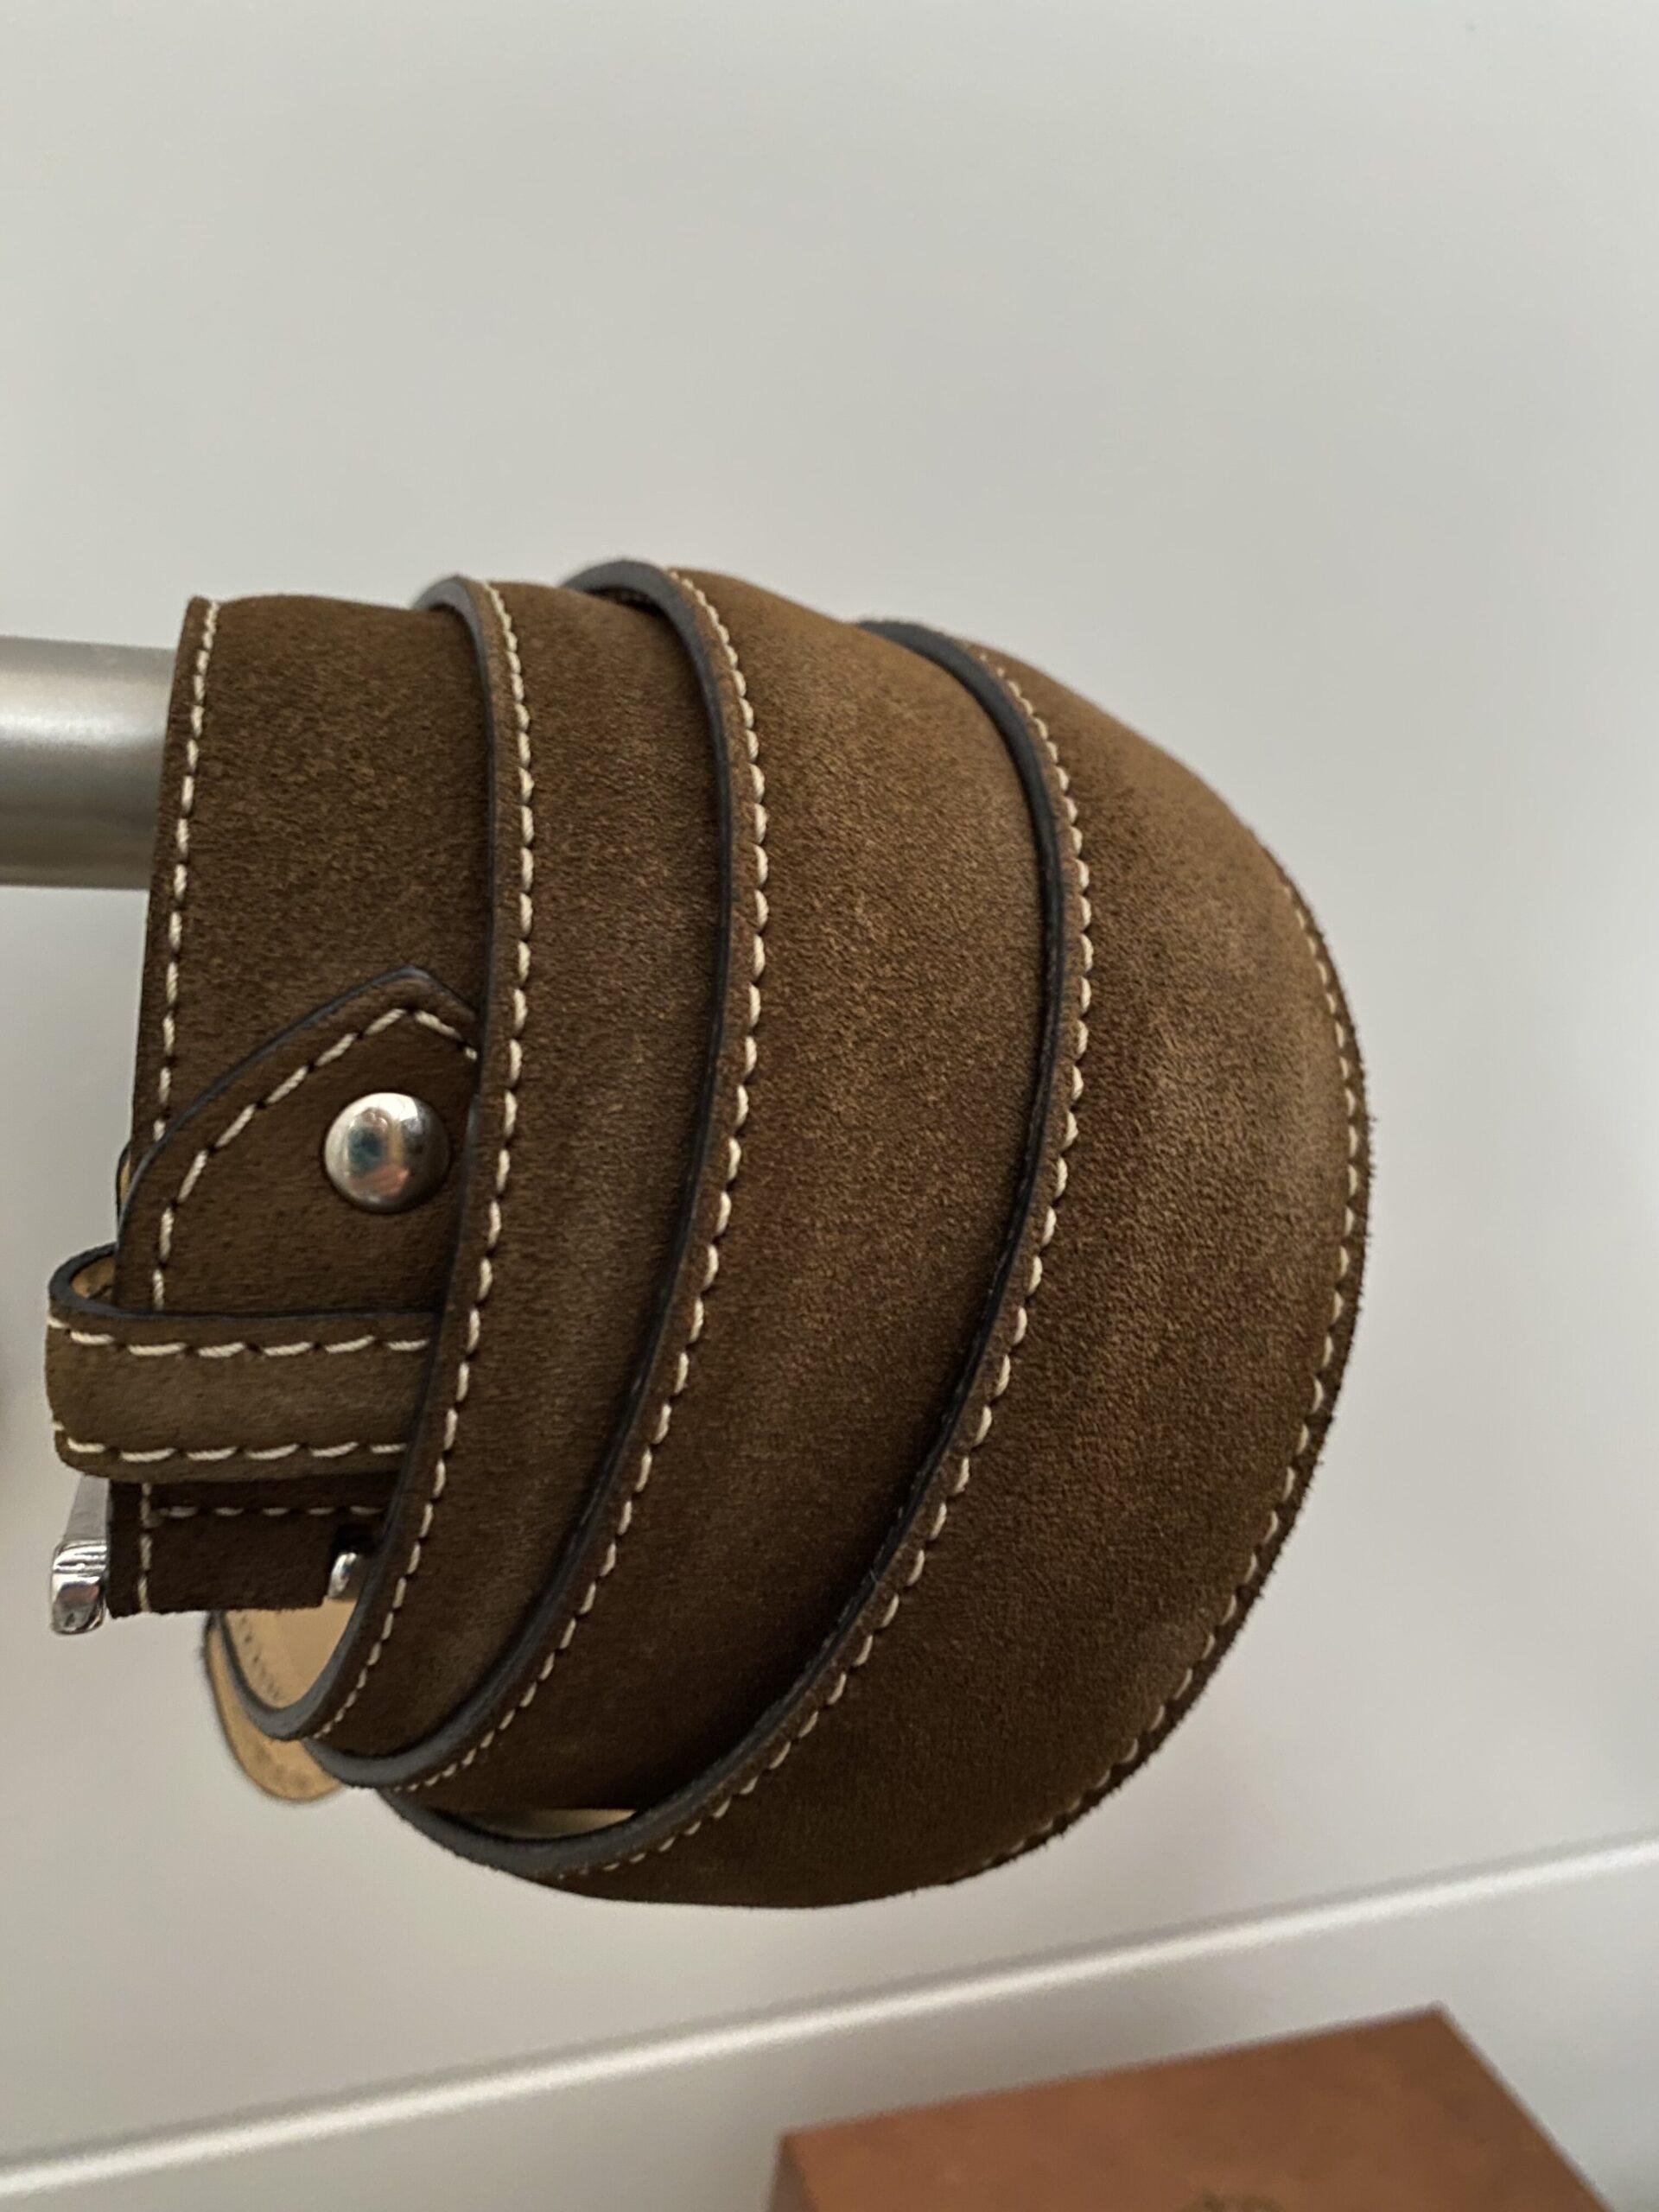 Berwick 1707 Florence Rame belt